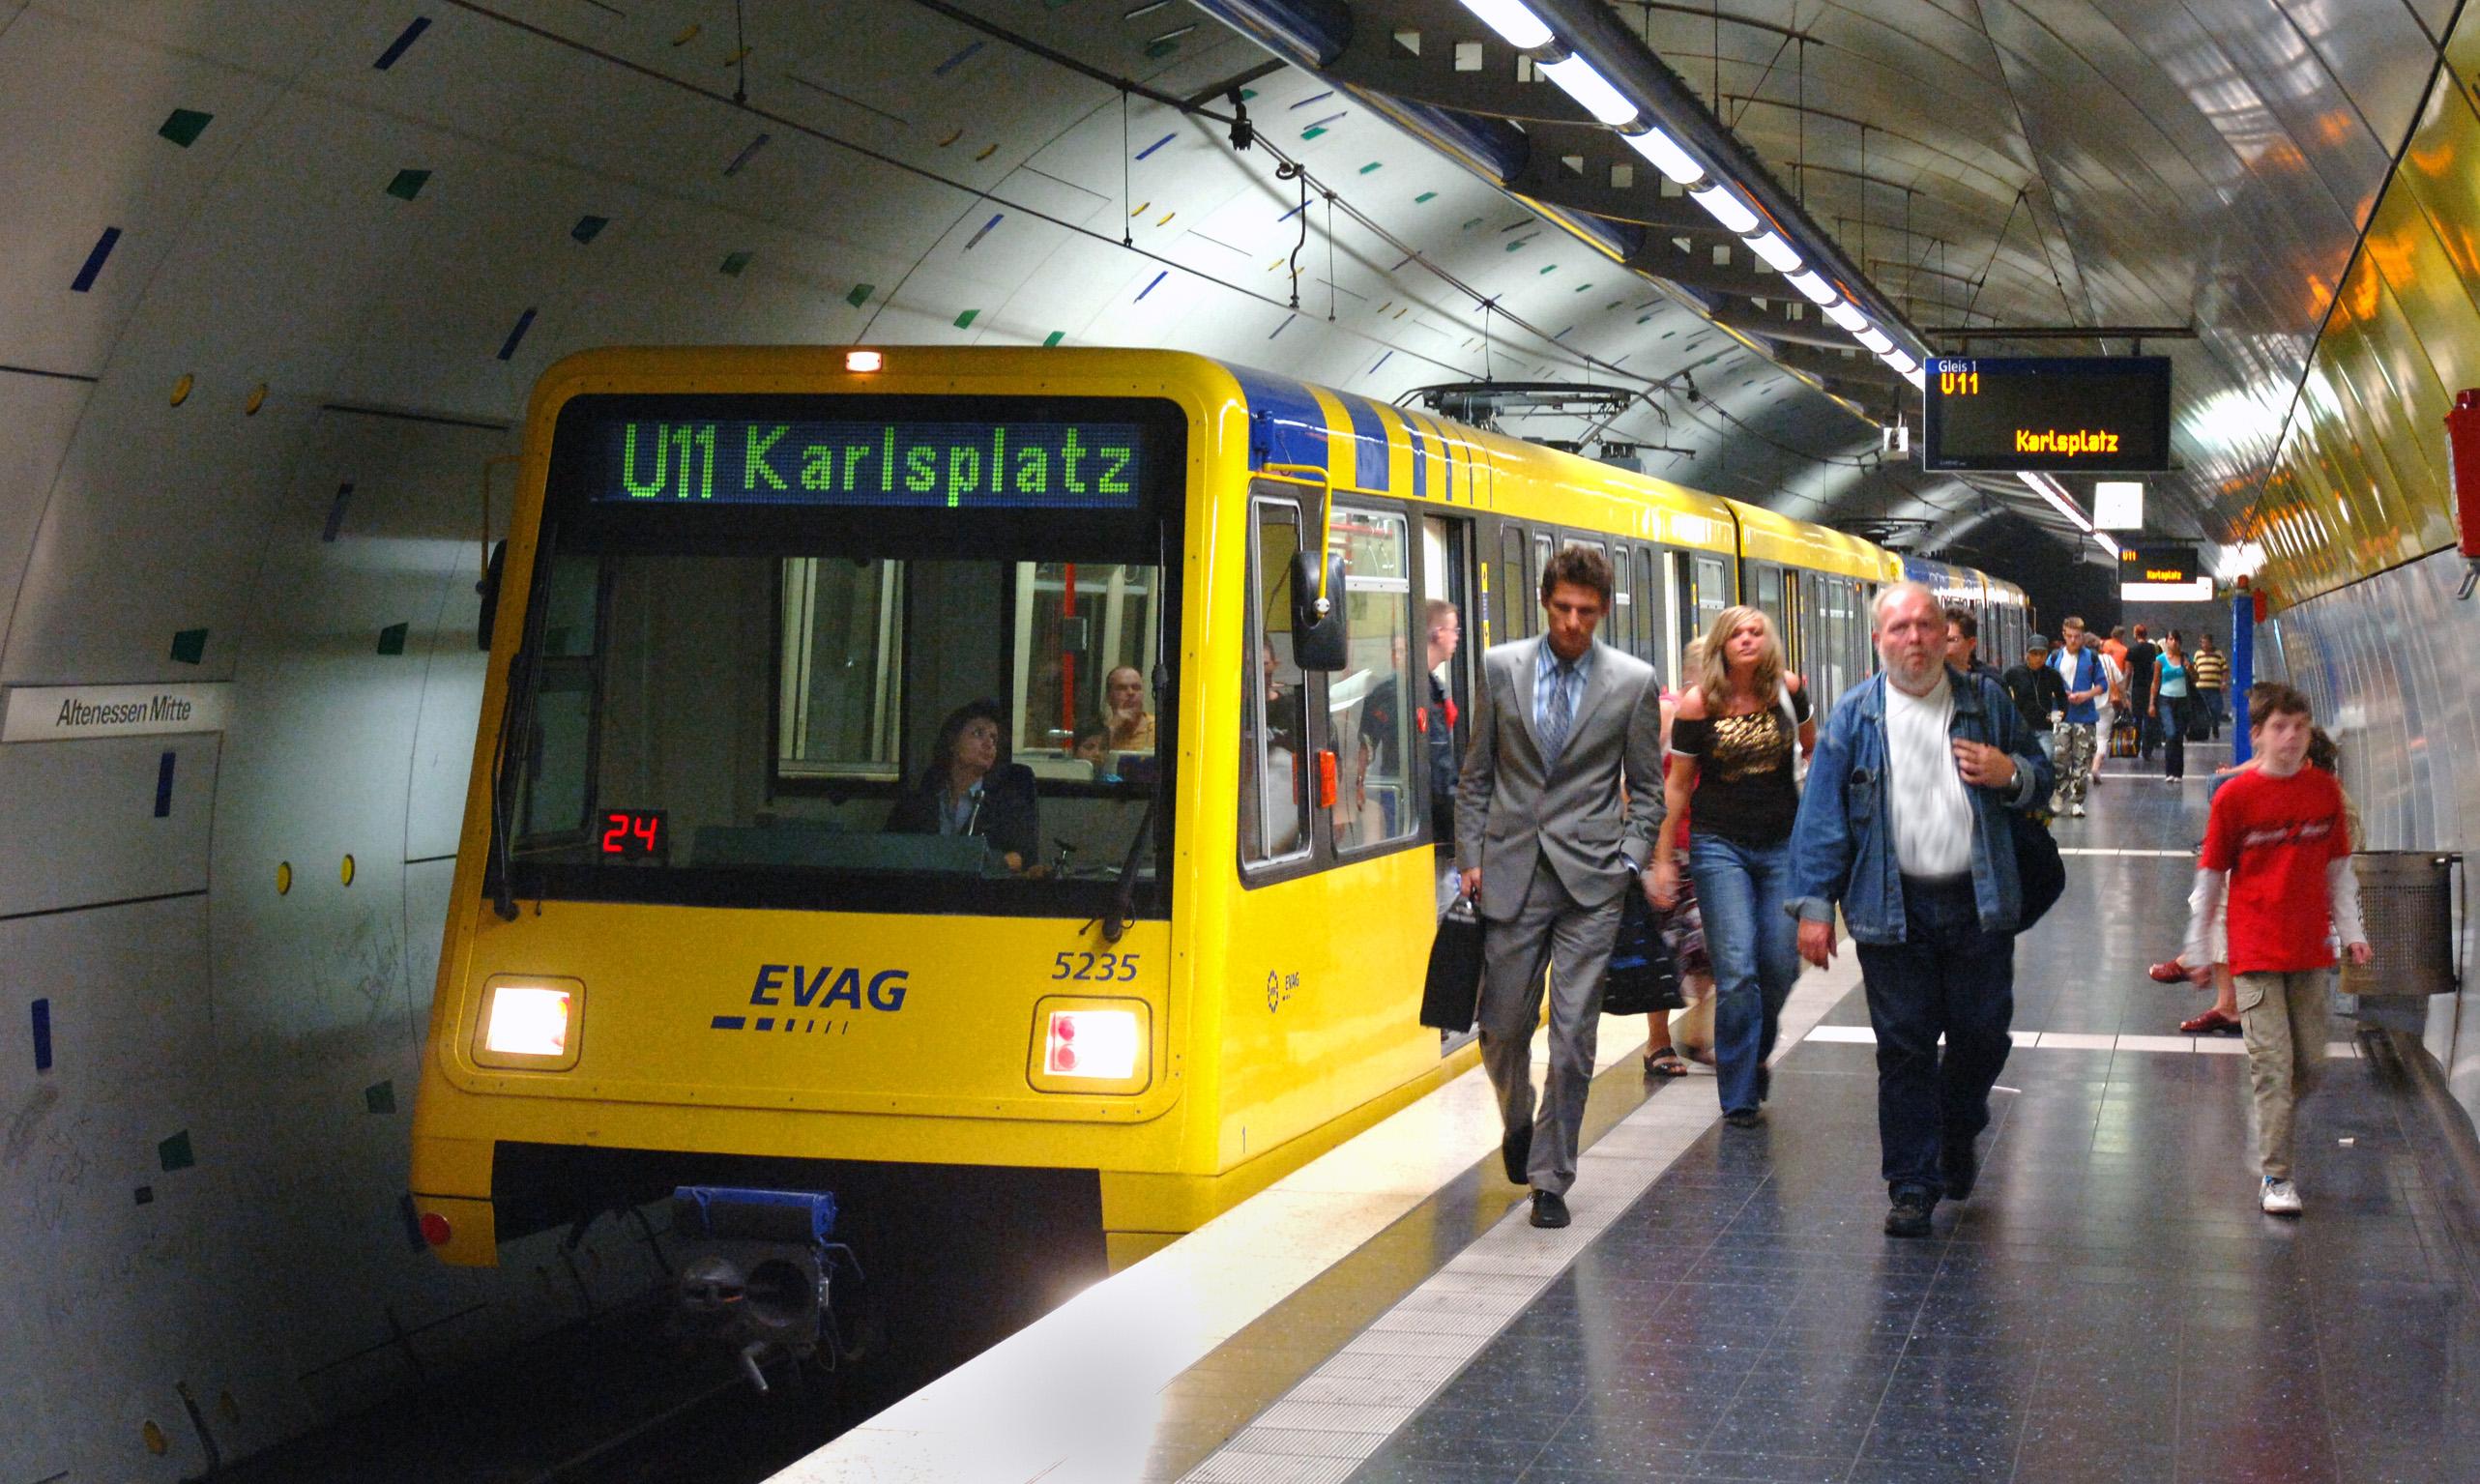 Foto: U-Bahn am Bahnsteig